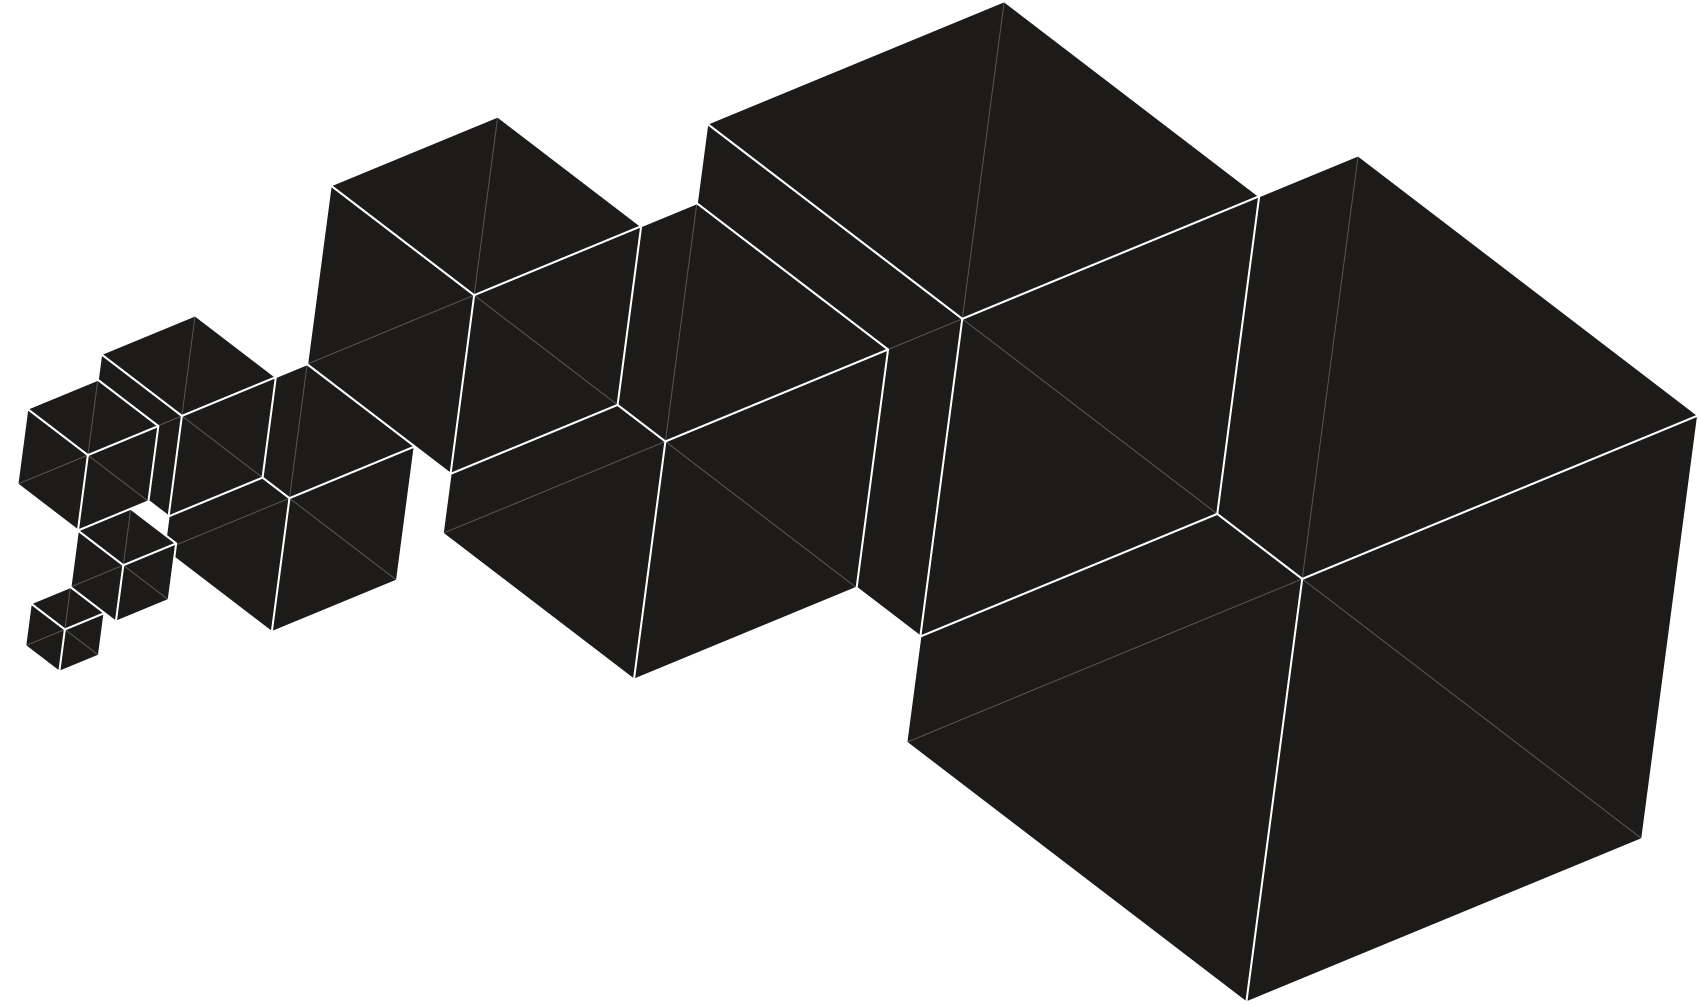 HEXAGONS_09.jpg